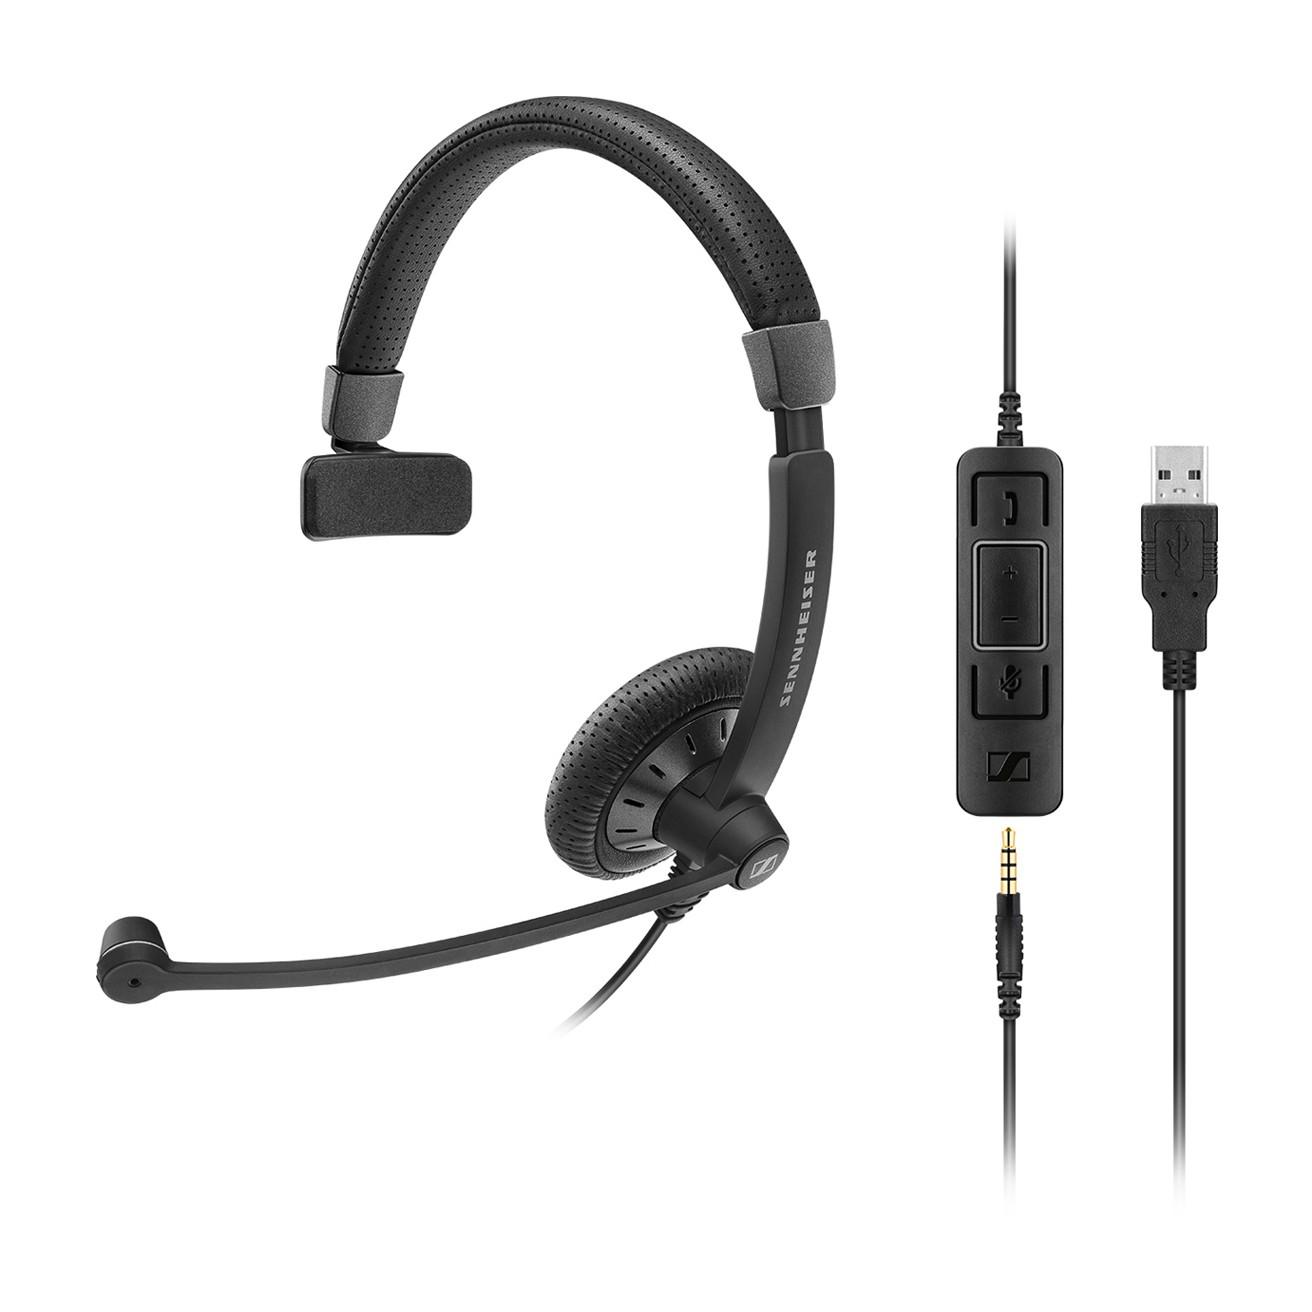 Sennheiser SC45 Mono USB Headset